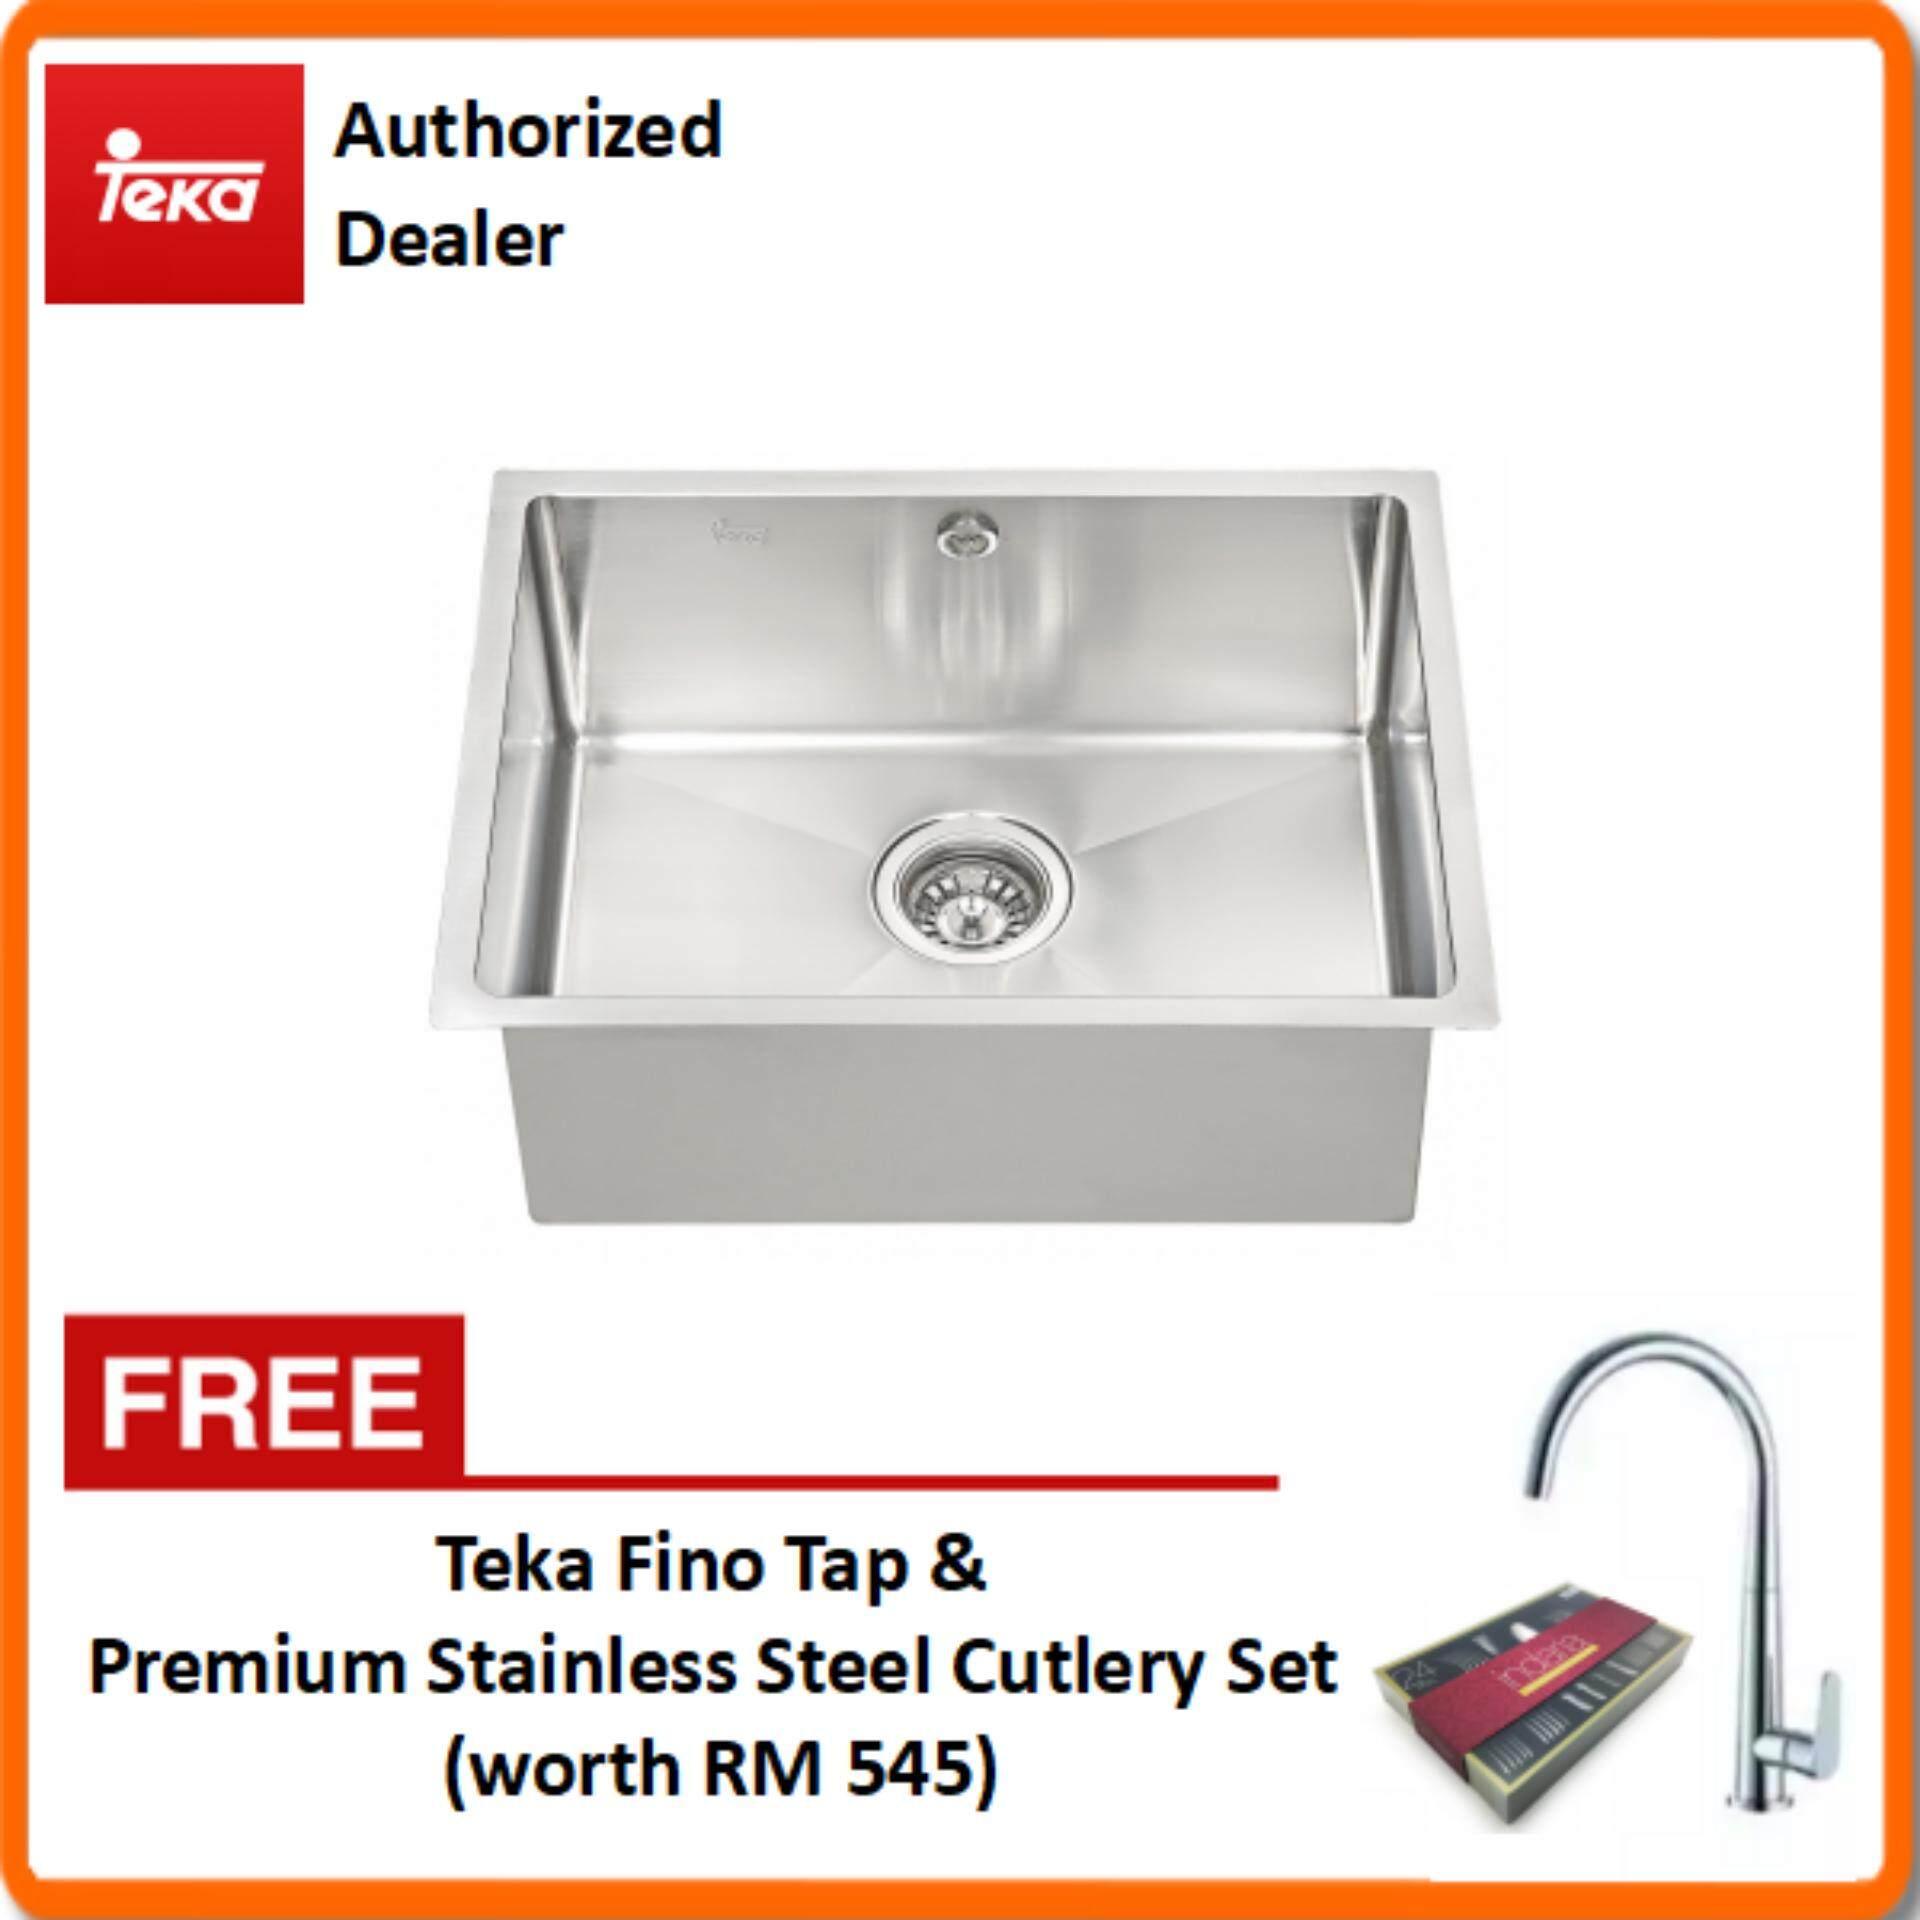 Harga Kitchen Sink Teka Clic Appliances Tips And Review Classic 1b 1d Sinks Tempat Cuci Piring Arq 43 Undermount